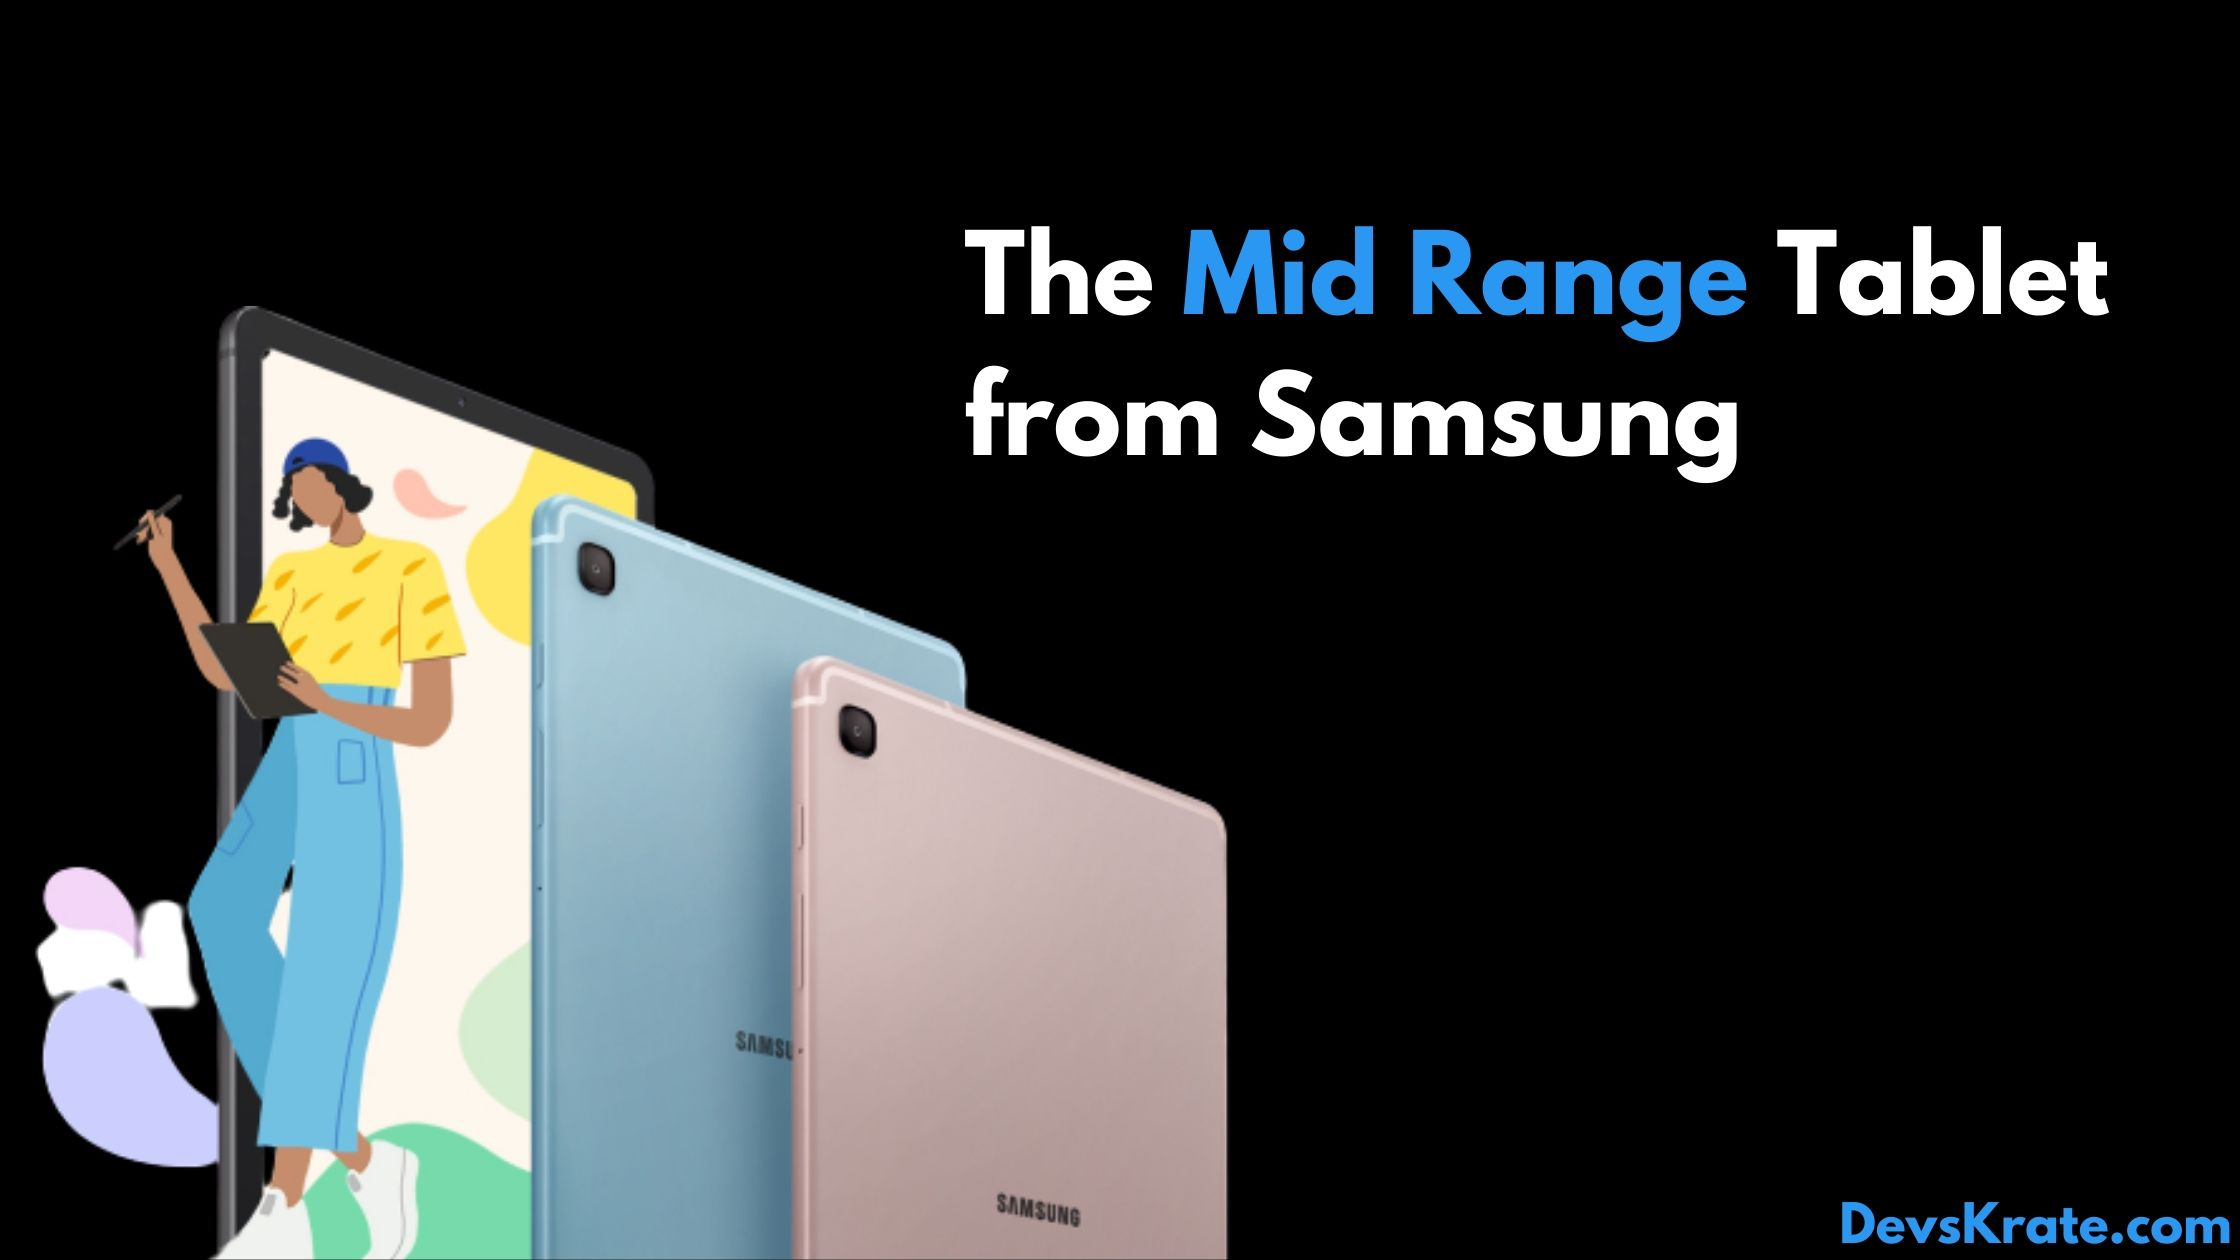 Galaxy Tab s6 Lite : Mid Range Tablet from Samsung